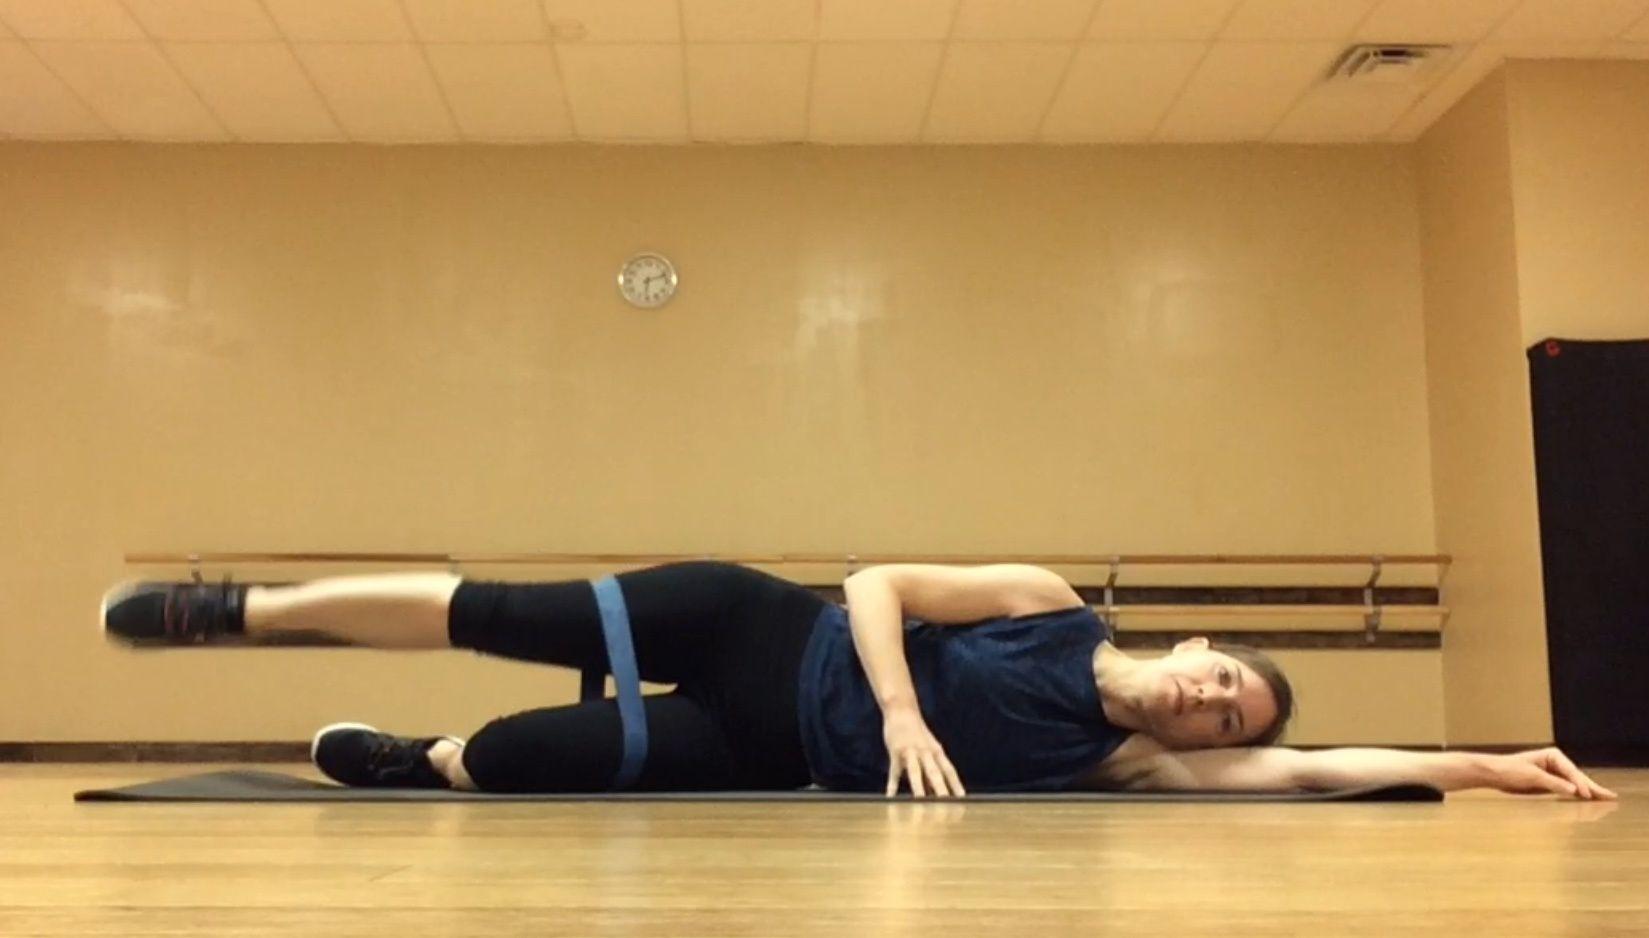 mini band leg raise